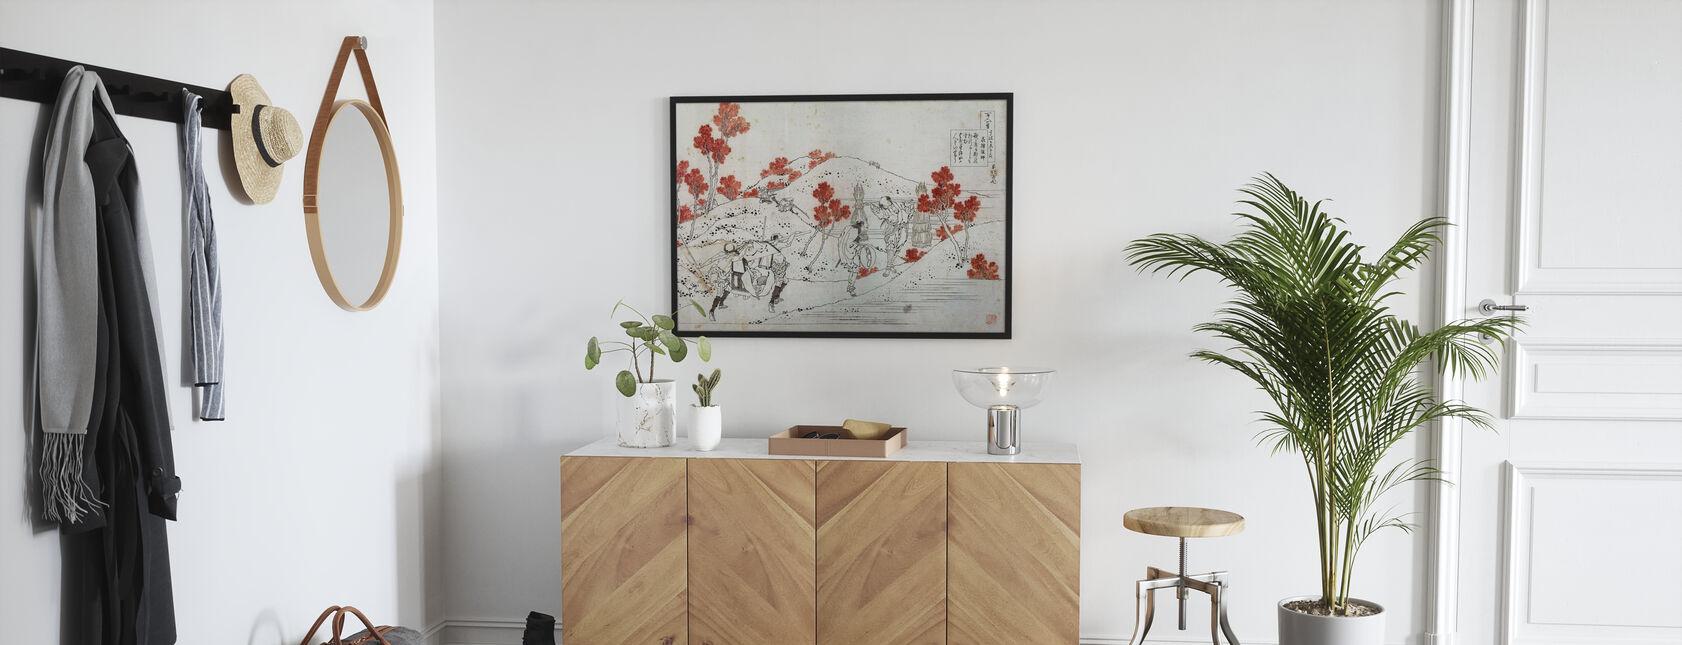 Porters Carry a Palanquin, Katsushika Hokusai - Poster - Hallway